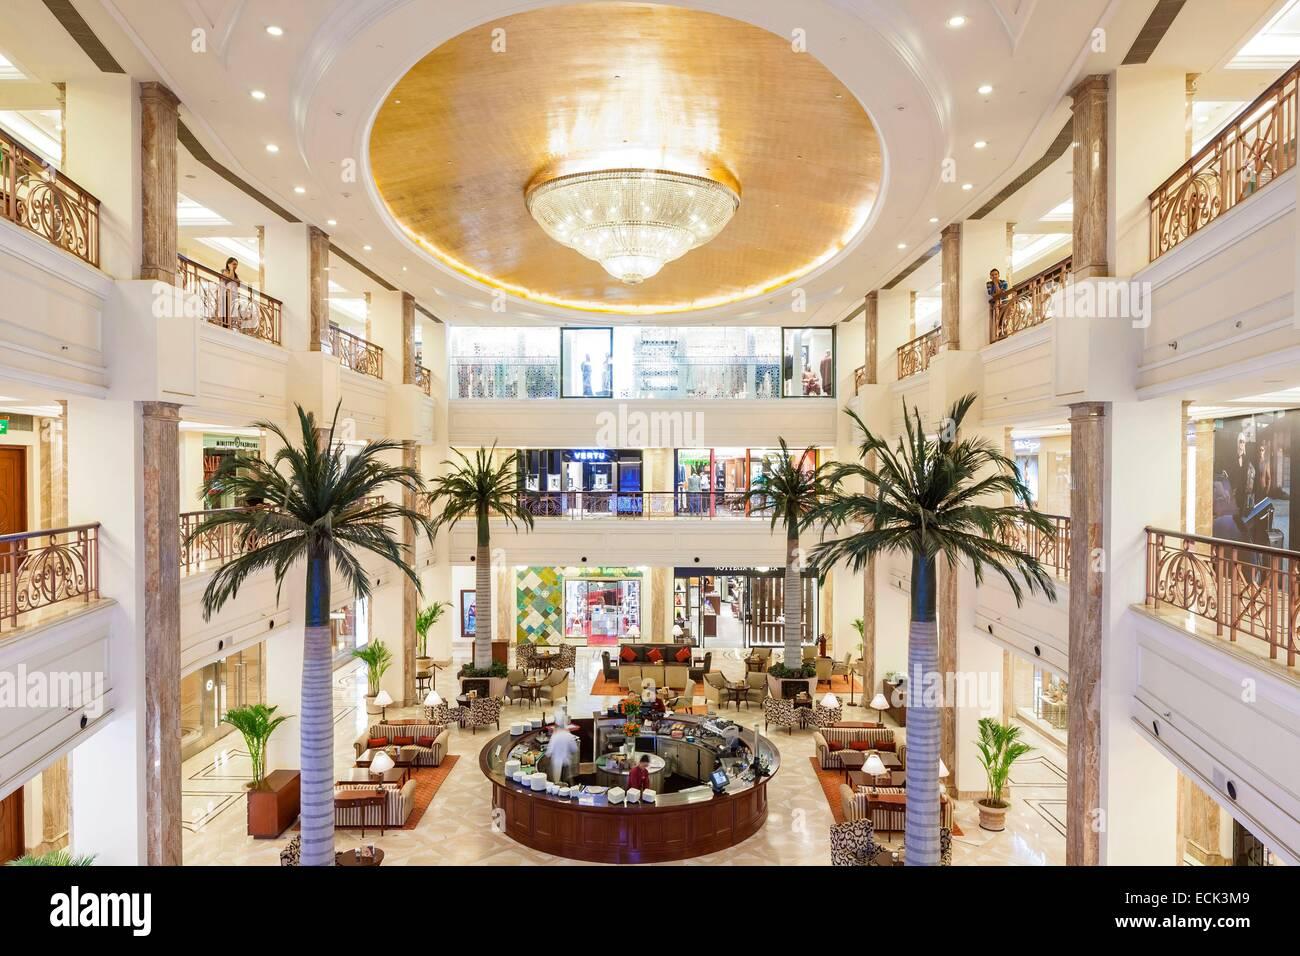 India, New Delhi, Vasant Kunj, luxury mall DLF Emporio - Stock Image